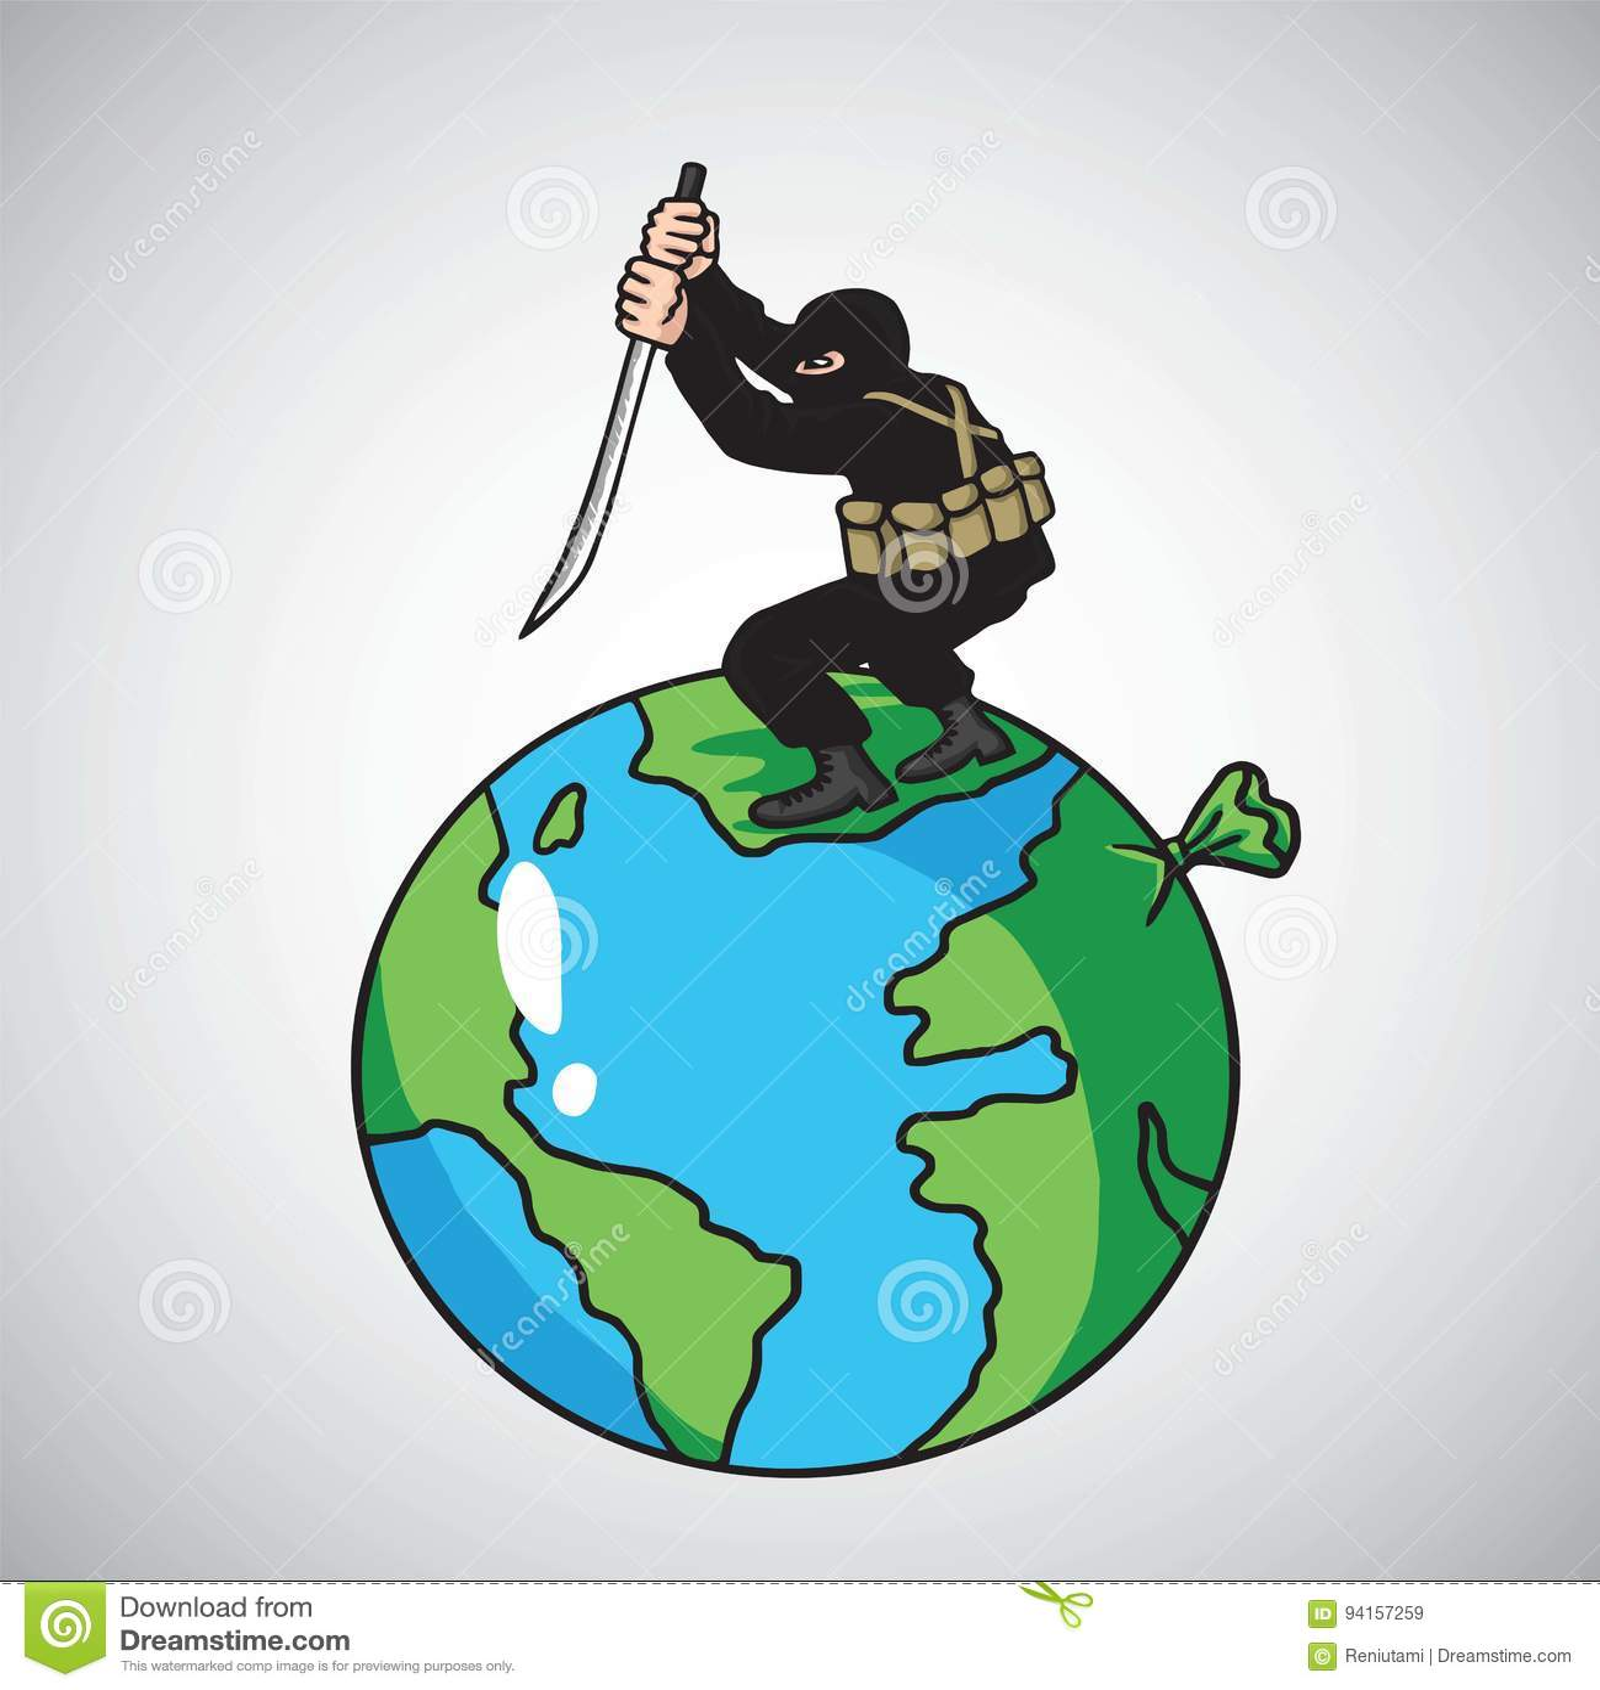 terrorist attack destroying the world peace vector cartoon illustration